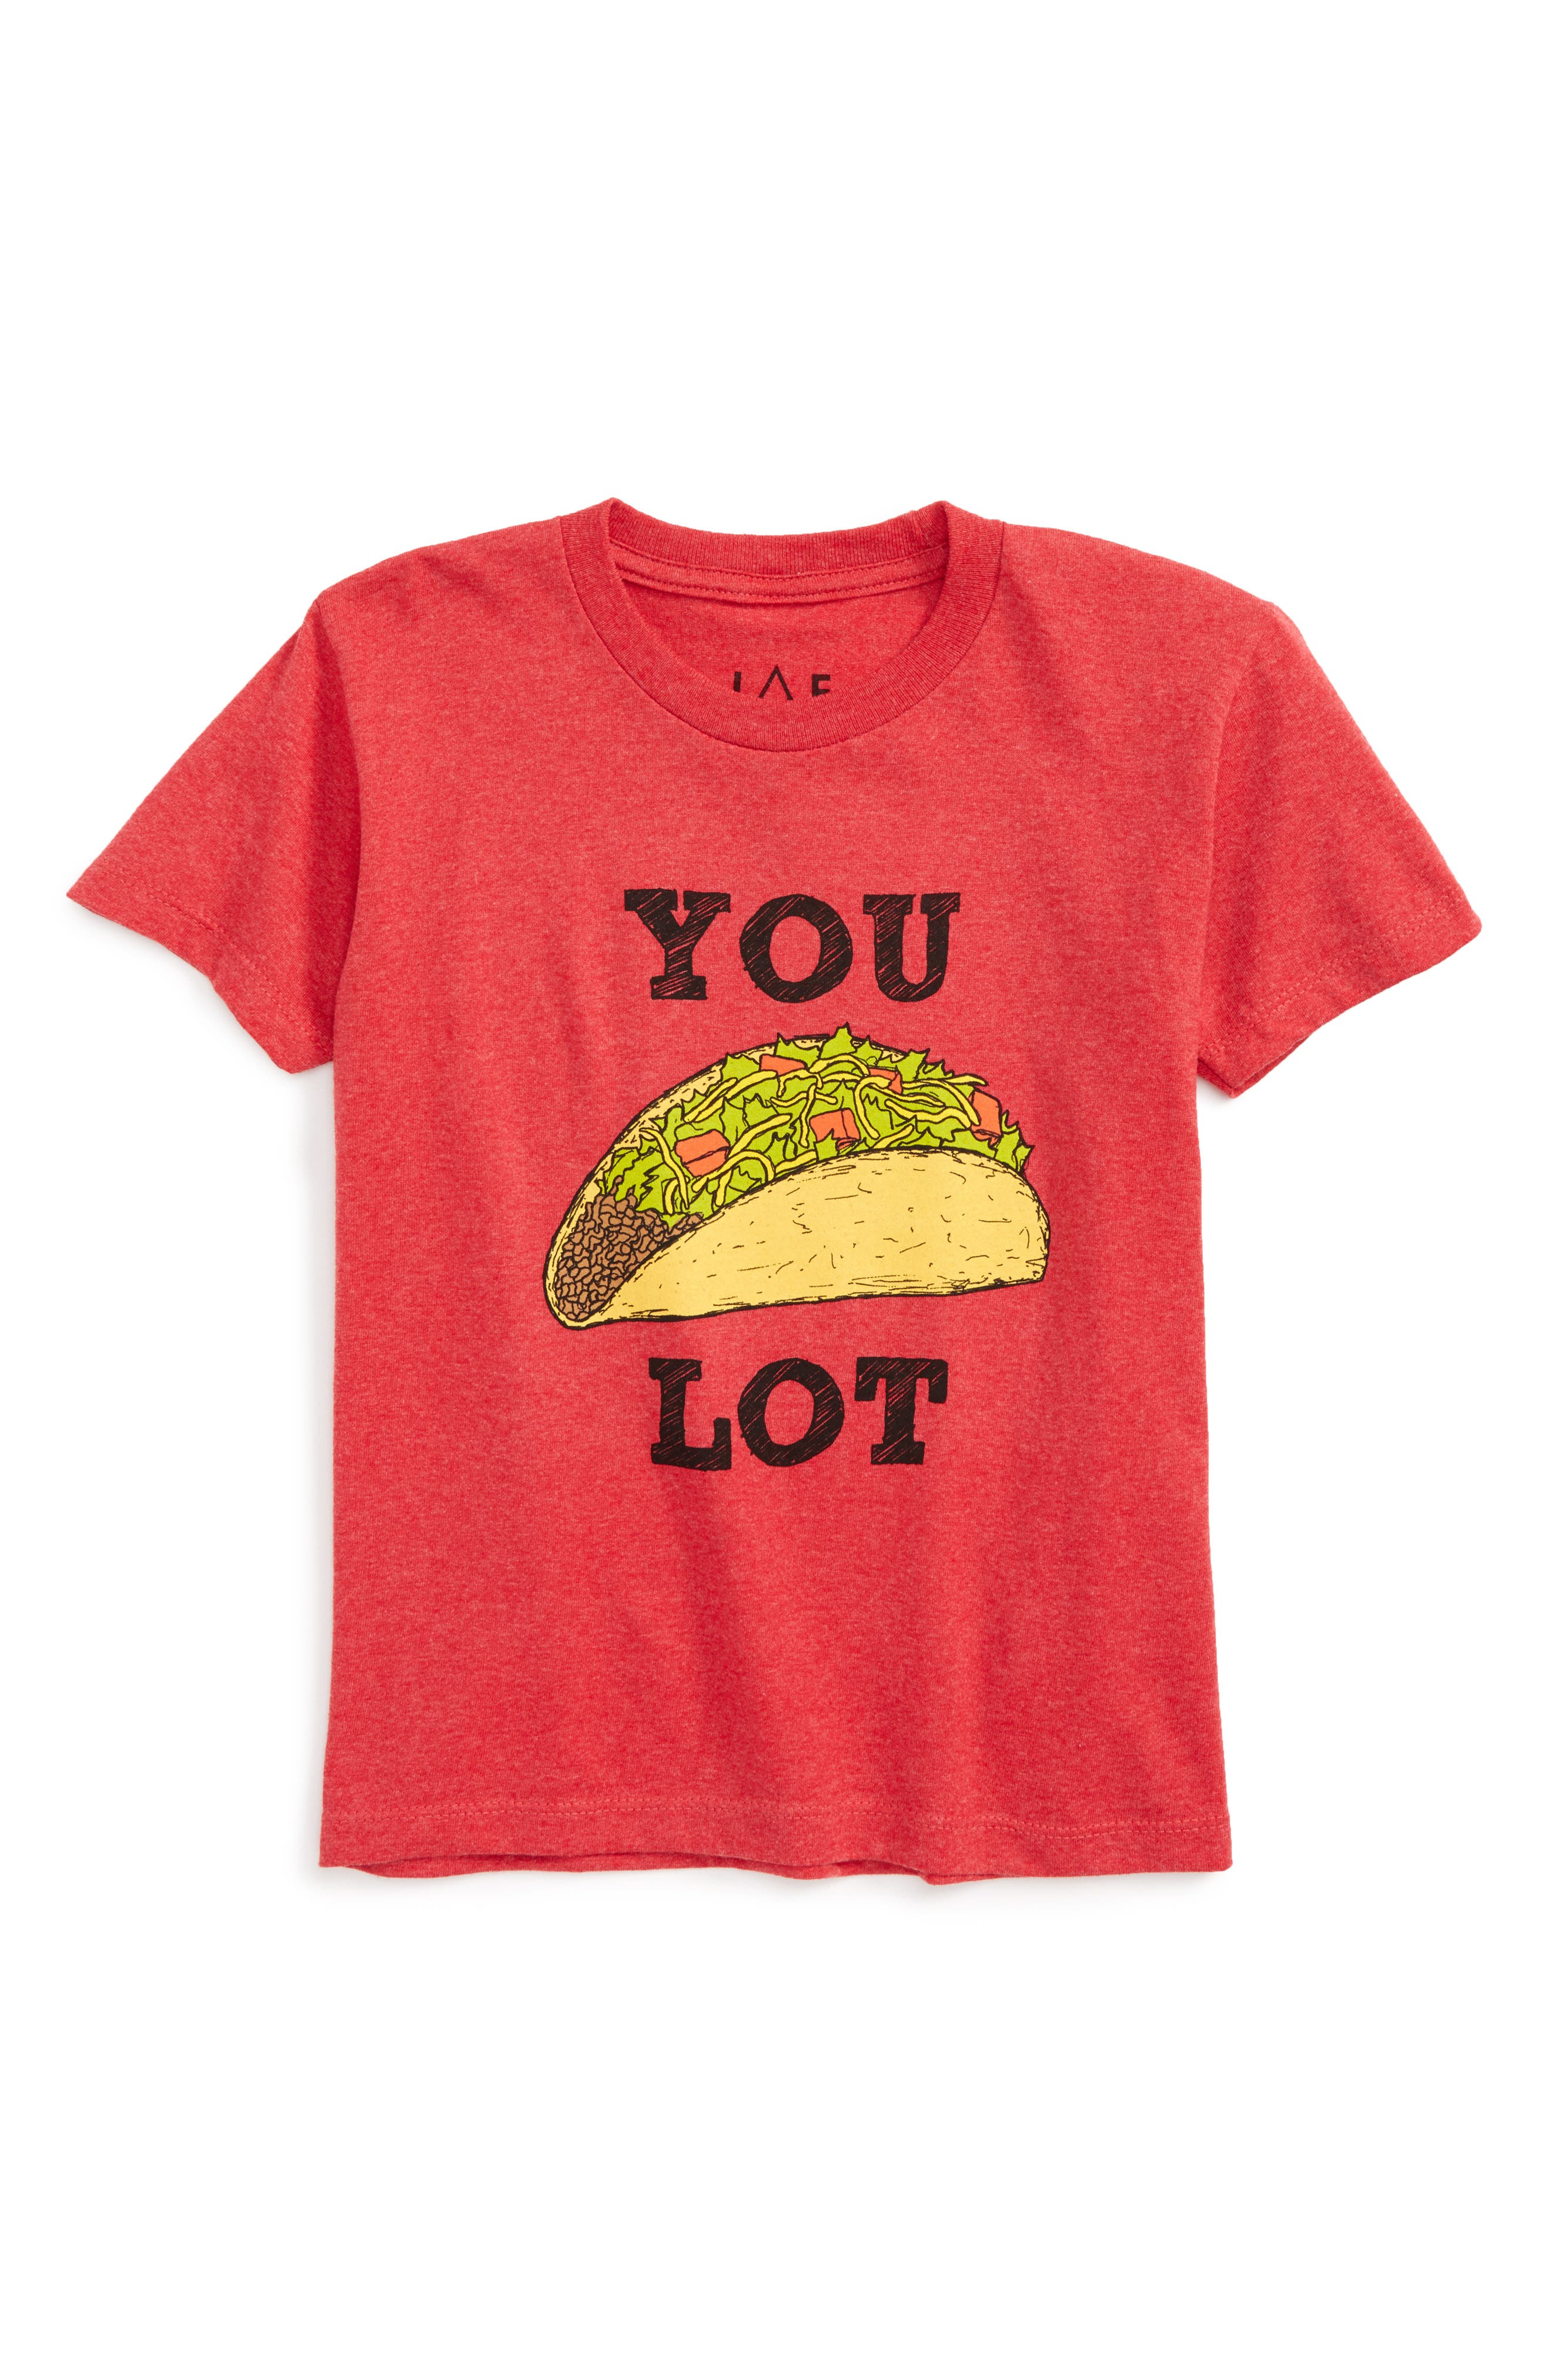 Jem You Taco Lot T-Shirt (Toddler Boys, Little Boys & Big Boys)